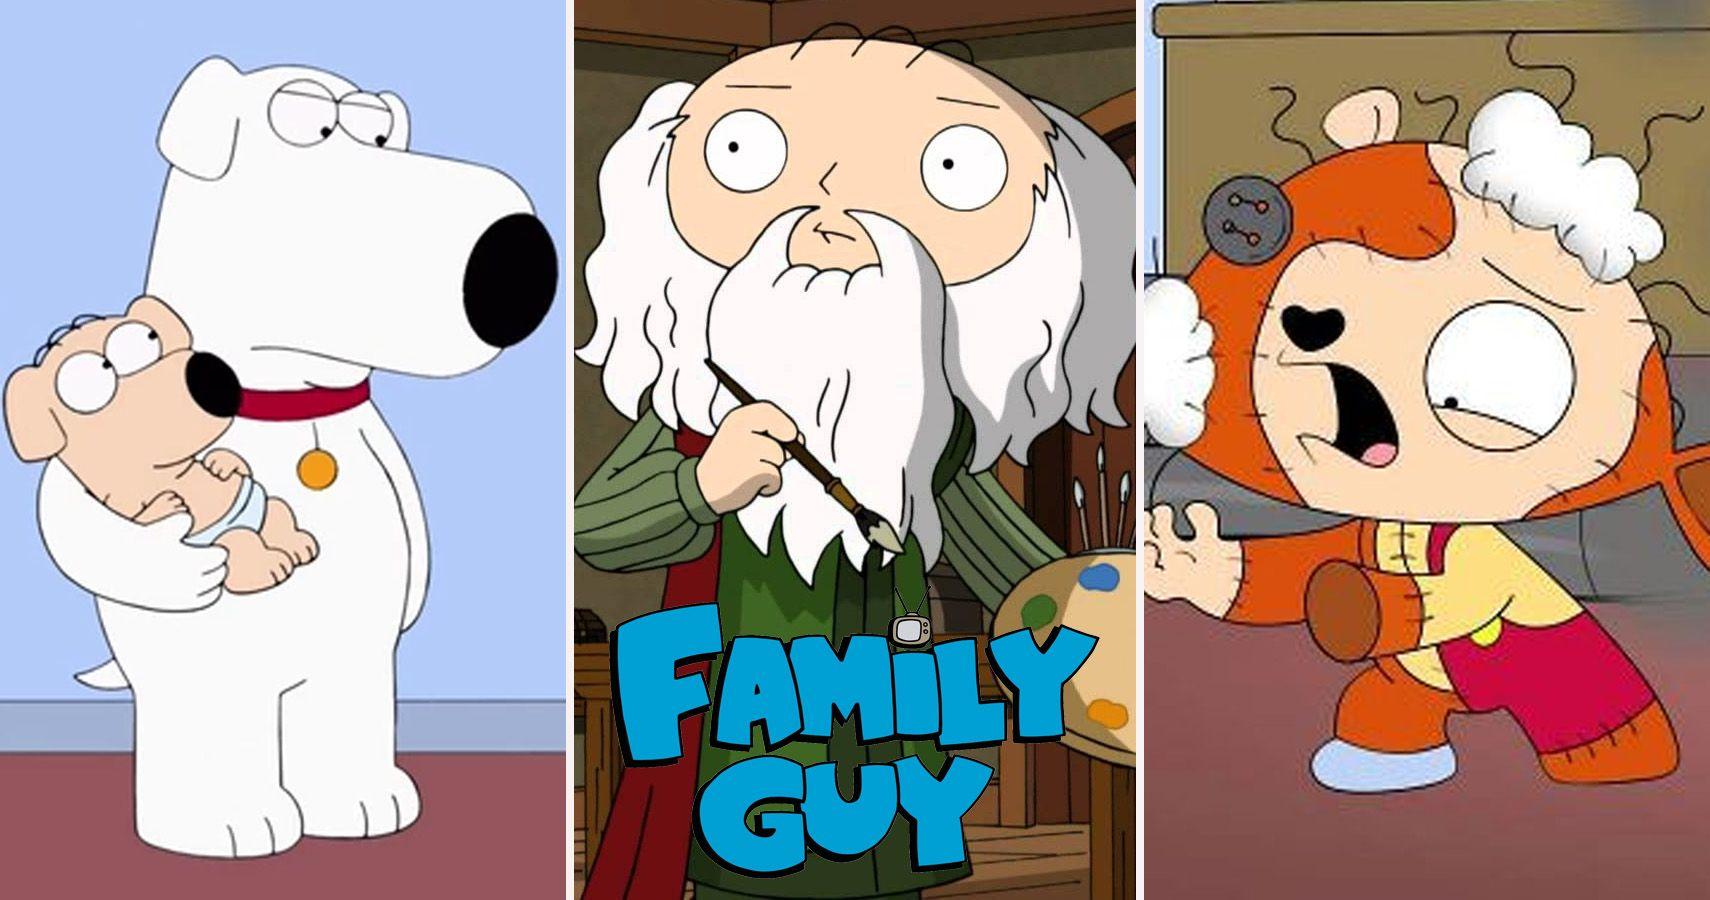 Family Guy Lois Spanks Stewie